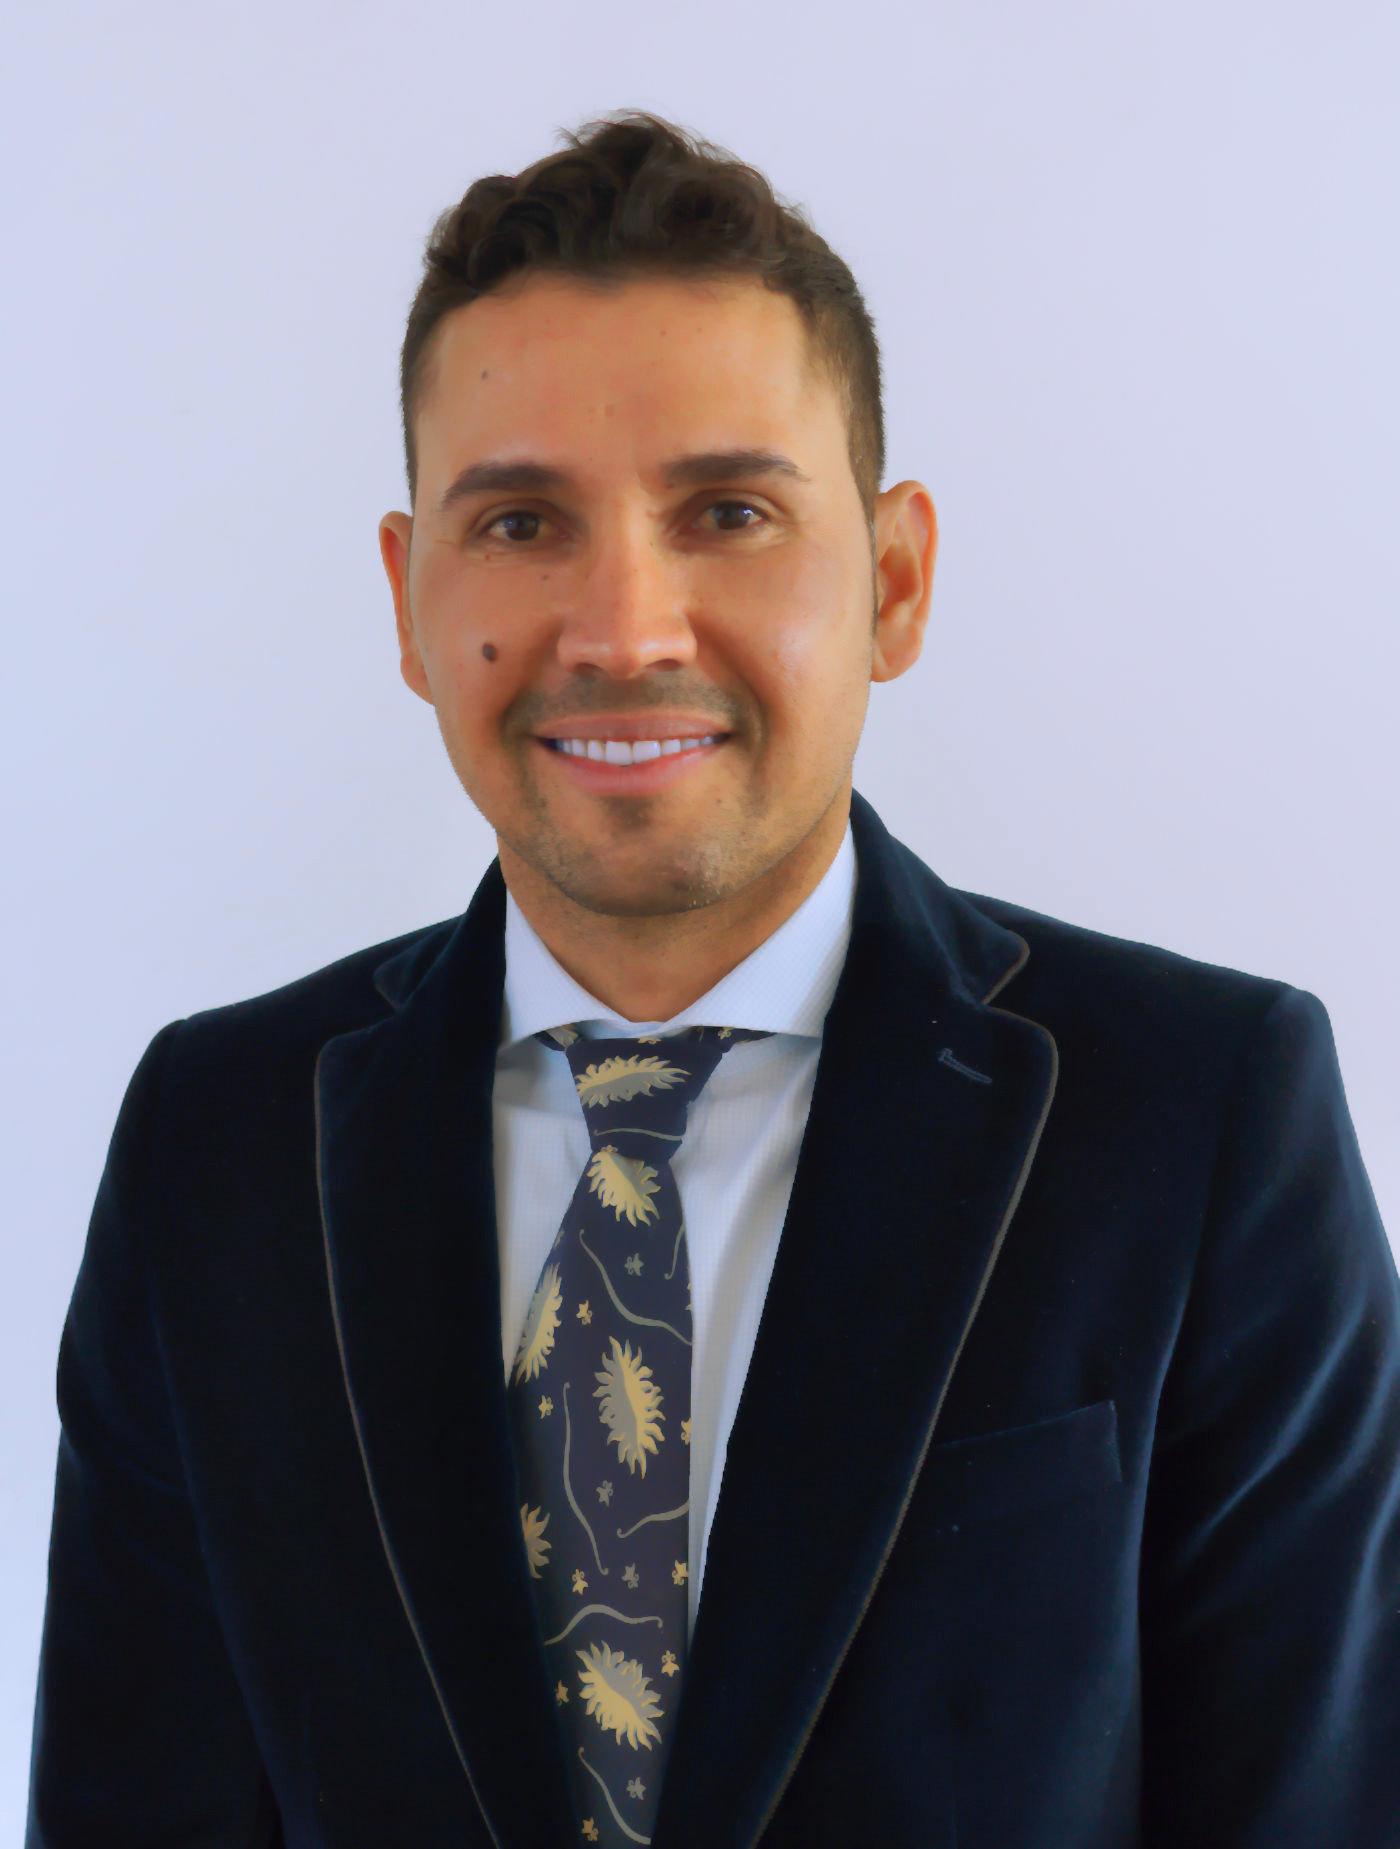 Adrian Toscano